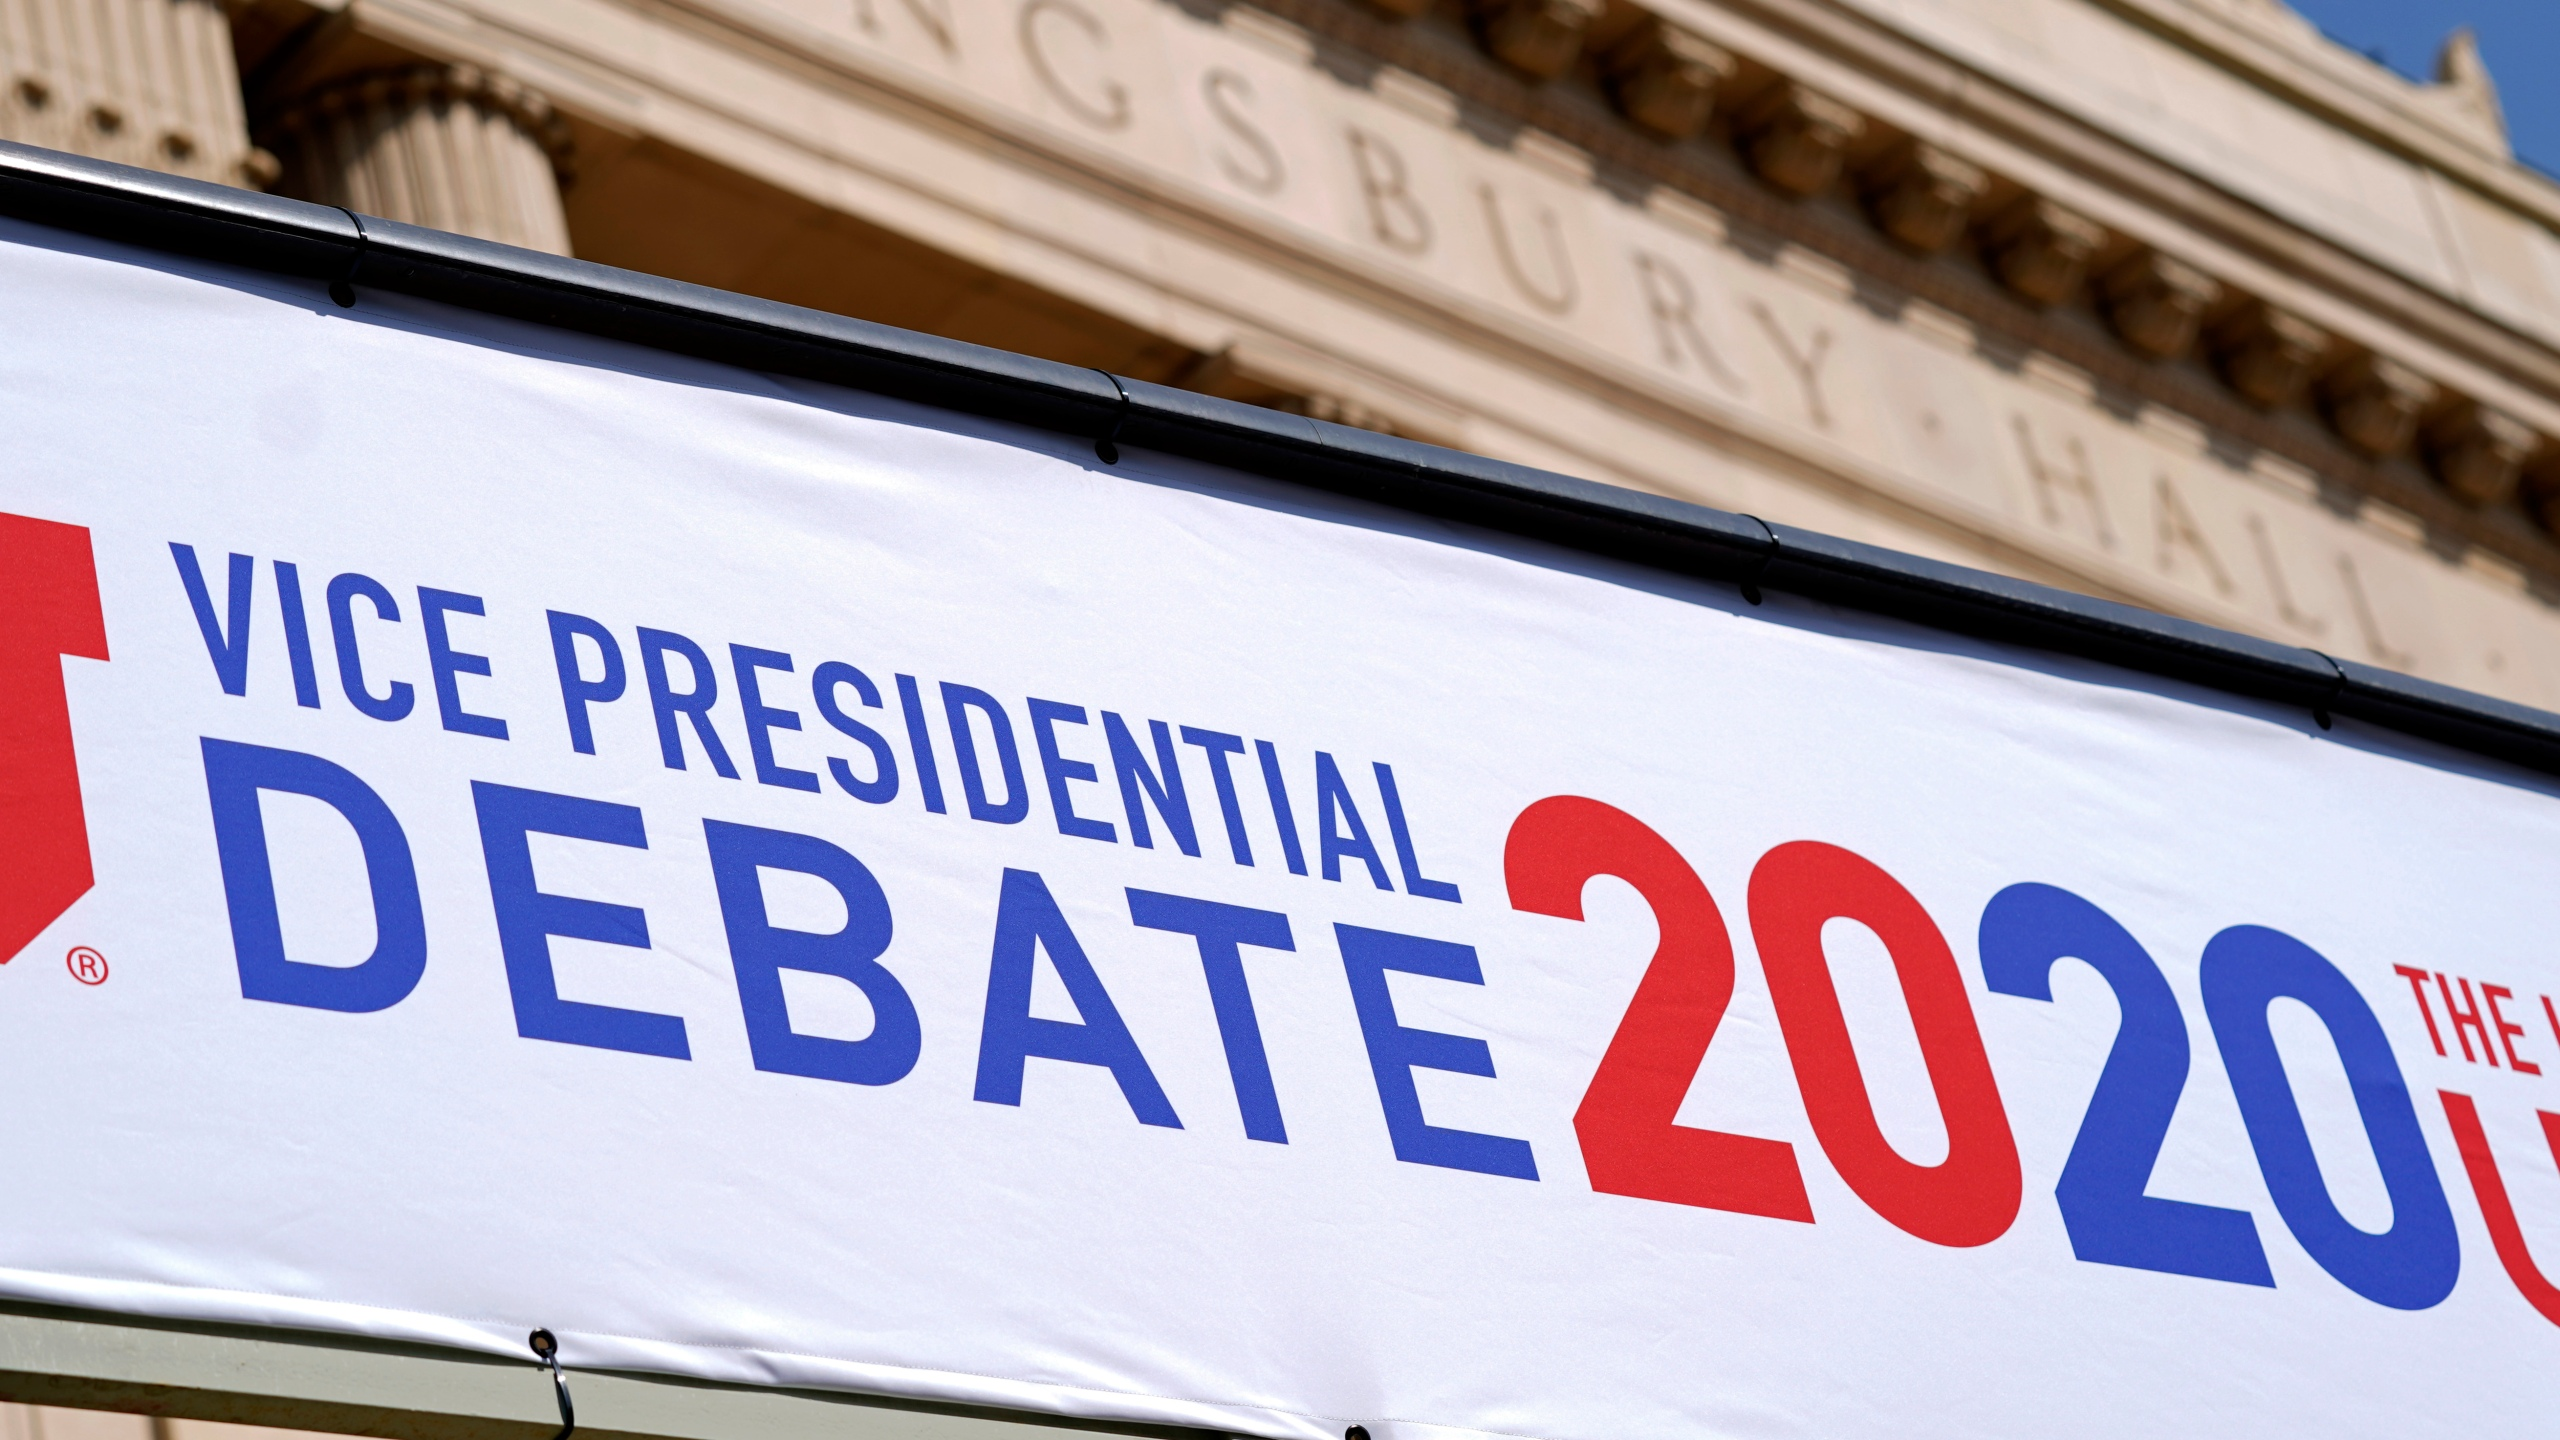 Preparations take place for the vice presidential debate outside Kingsbury Hall at the University of Utah, Monday, Oct. 5, 2020, in Salt Lake City. (AP Photo/Patrick Semansky)